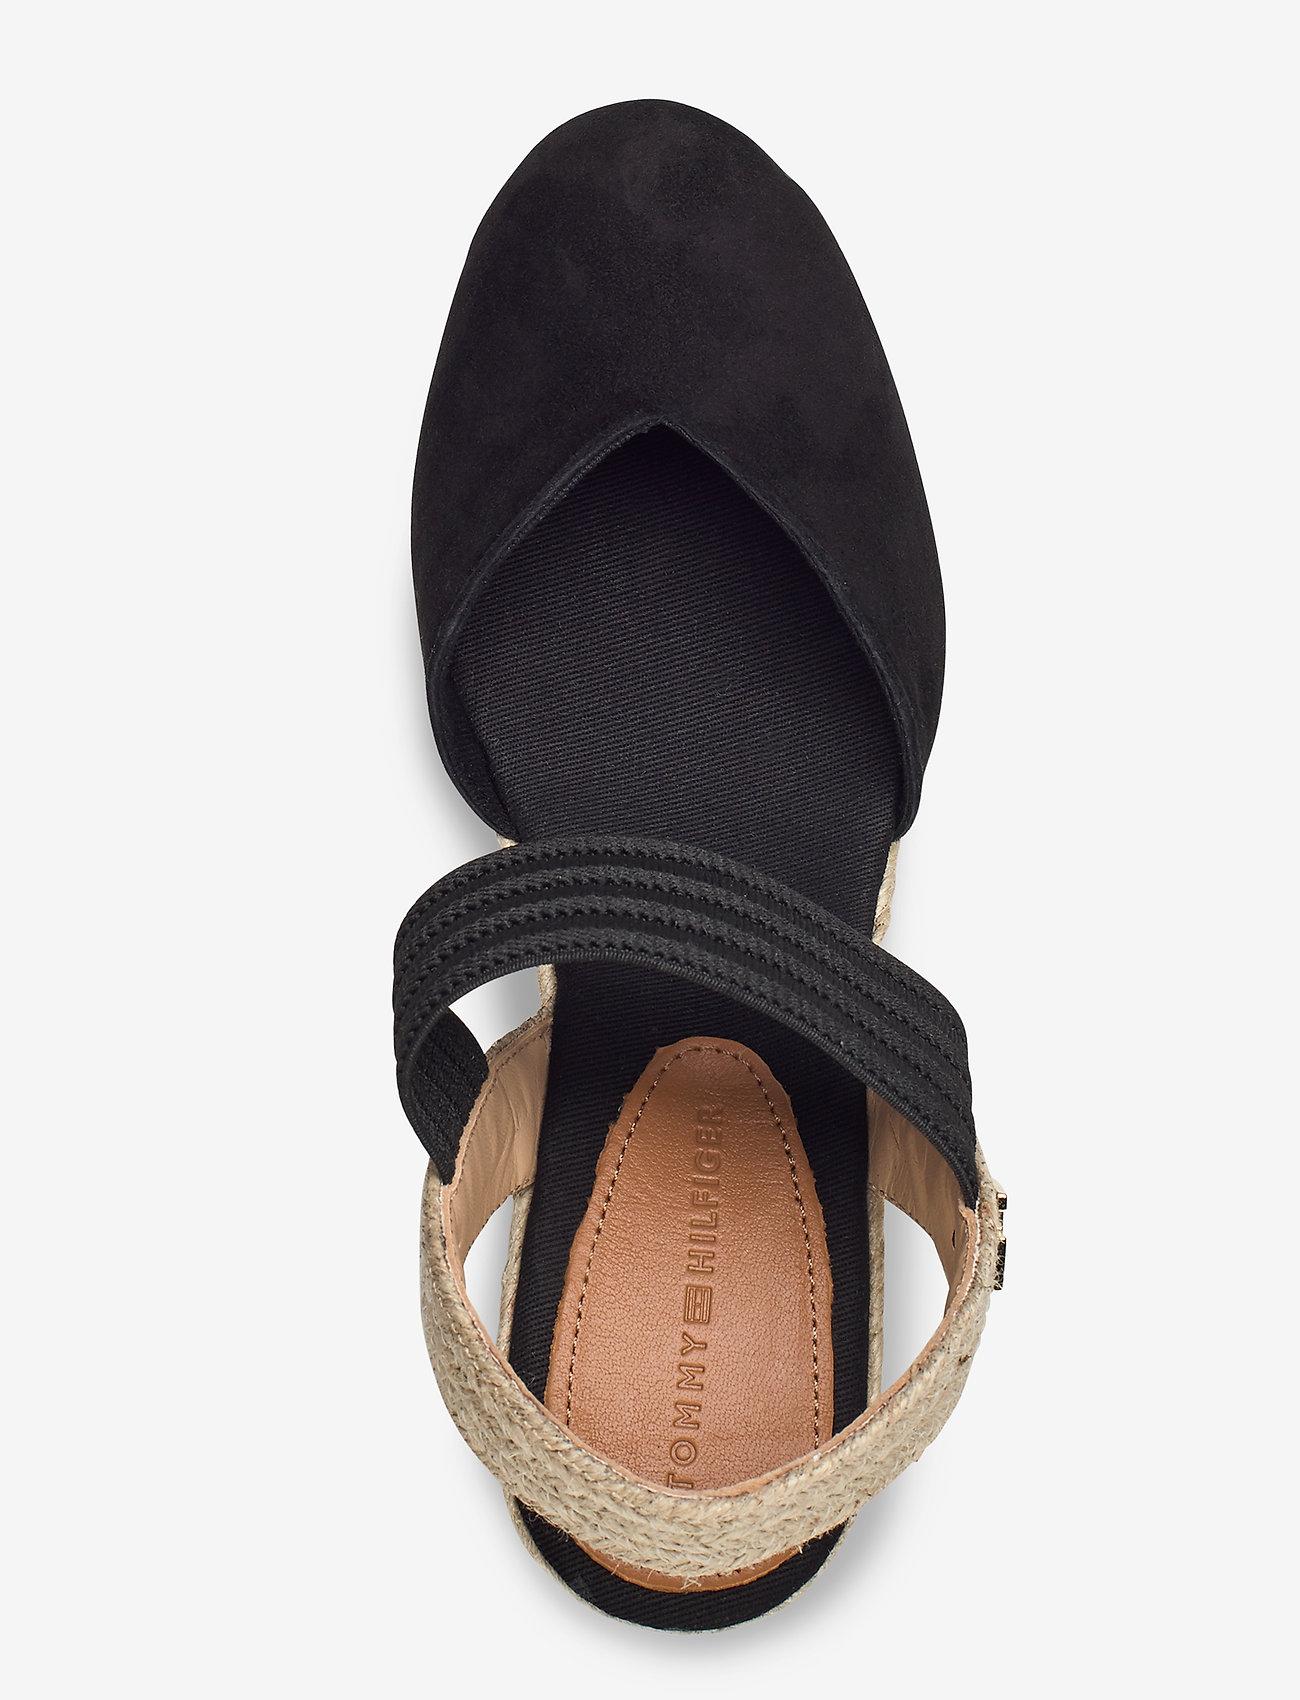 New Th Basbasic Toe Wedge (Black) - Tommy Hilfiger